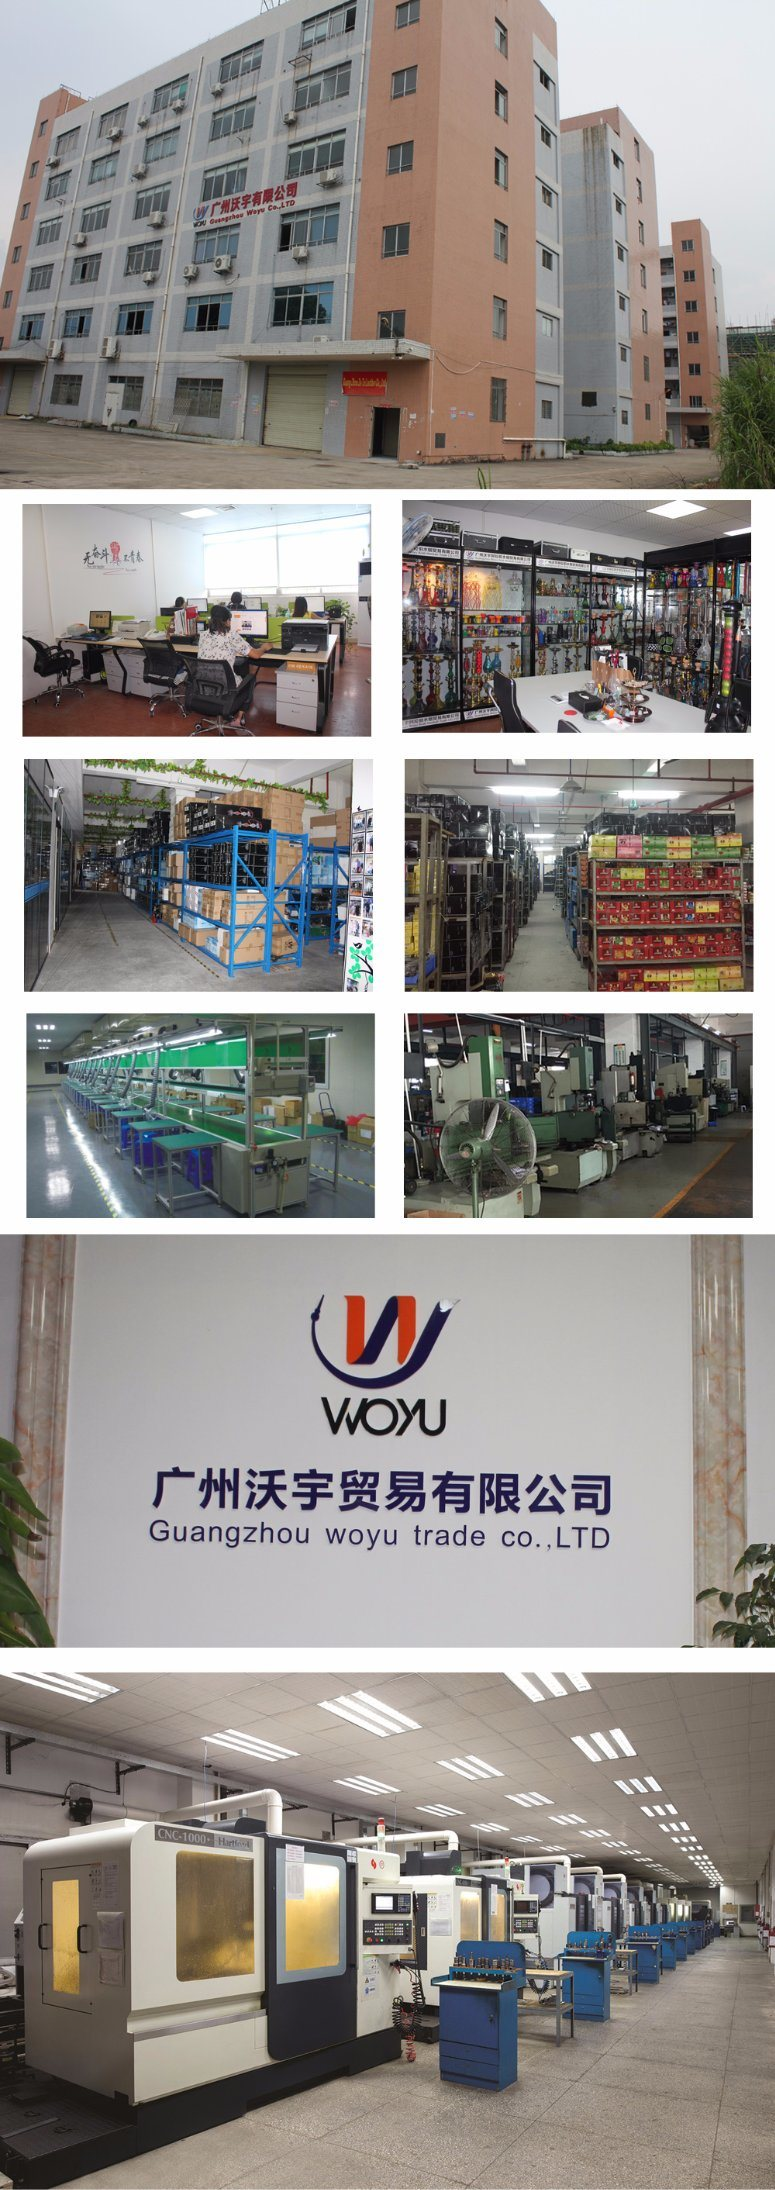 China Fatory Wholesale Shisha Hookah Chicha High Quality Shisha Aluminum Hookah Narguile Water Pipe E Liquid Electronic Cigarette Glass Pipe Cigarette